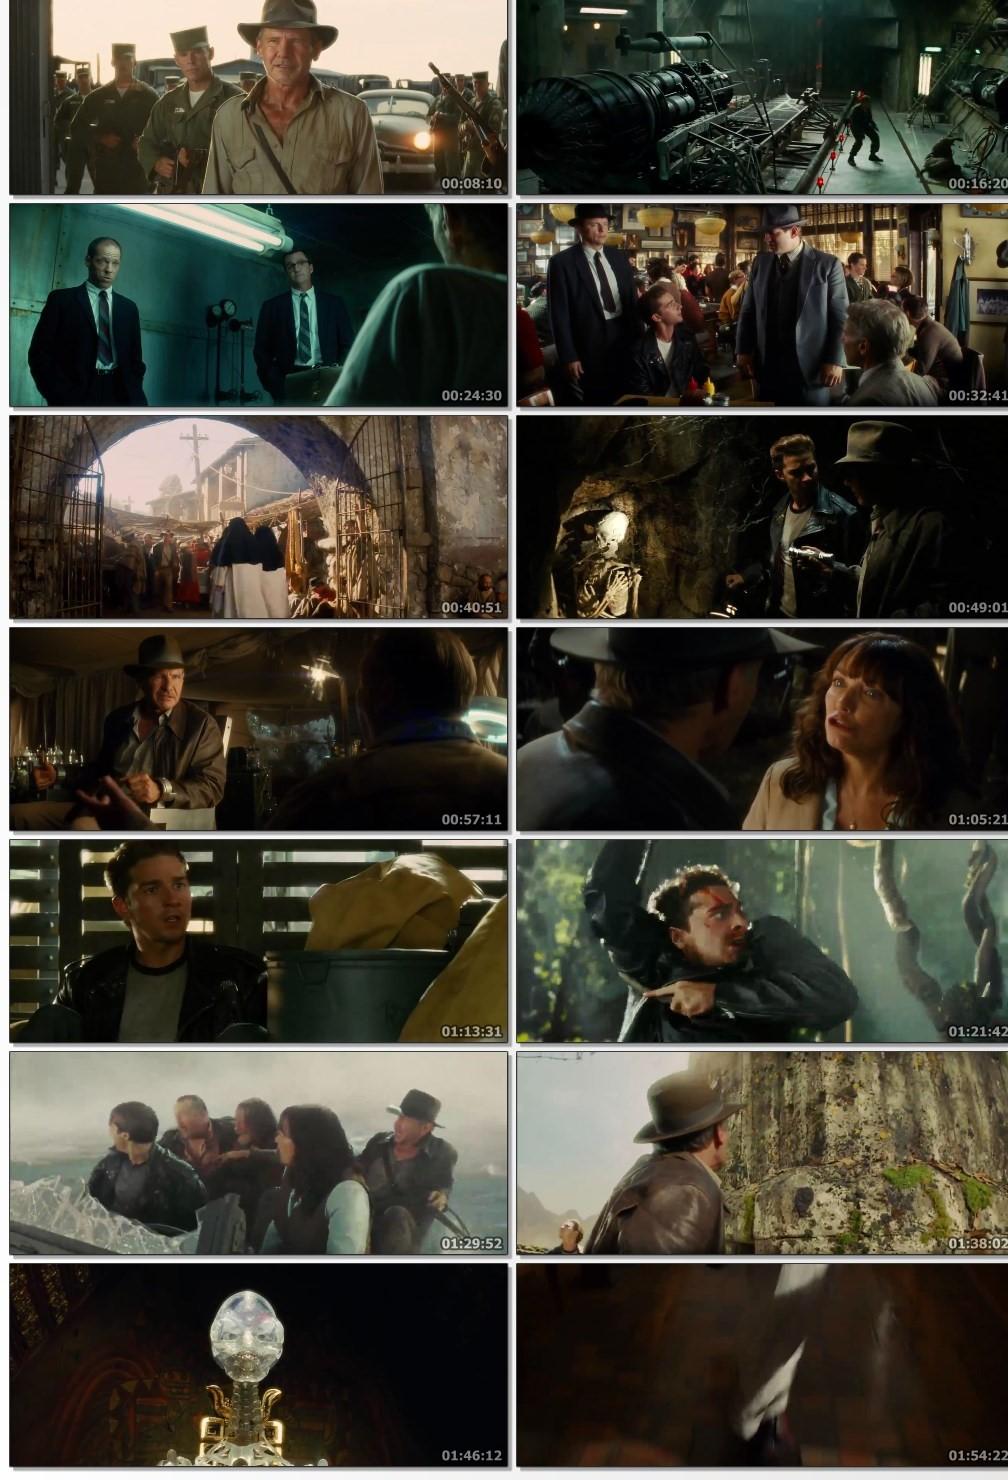 Indiana-Jones-and-the-Kingdom-of-the-Crystal-Skull-2008-Hindi-Dual-Audio-720p-Blu-Ray-ESub-900-MB-mk